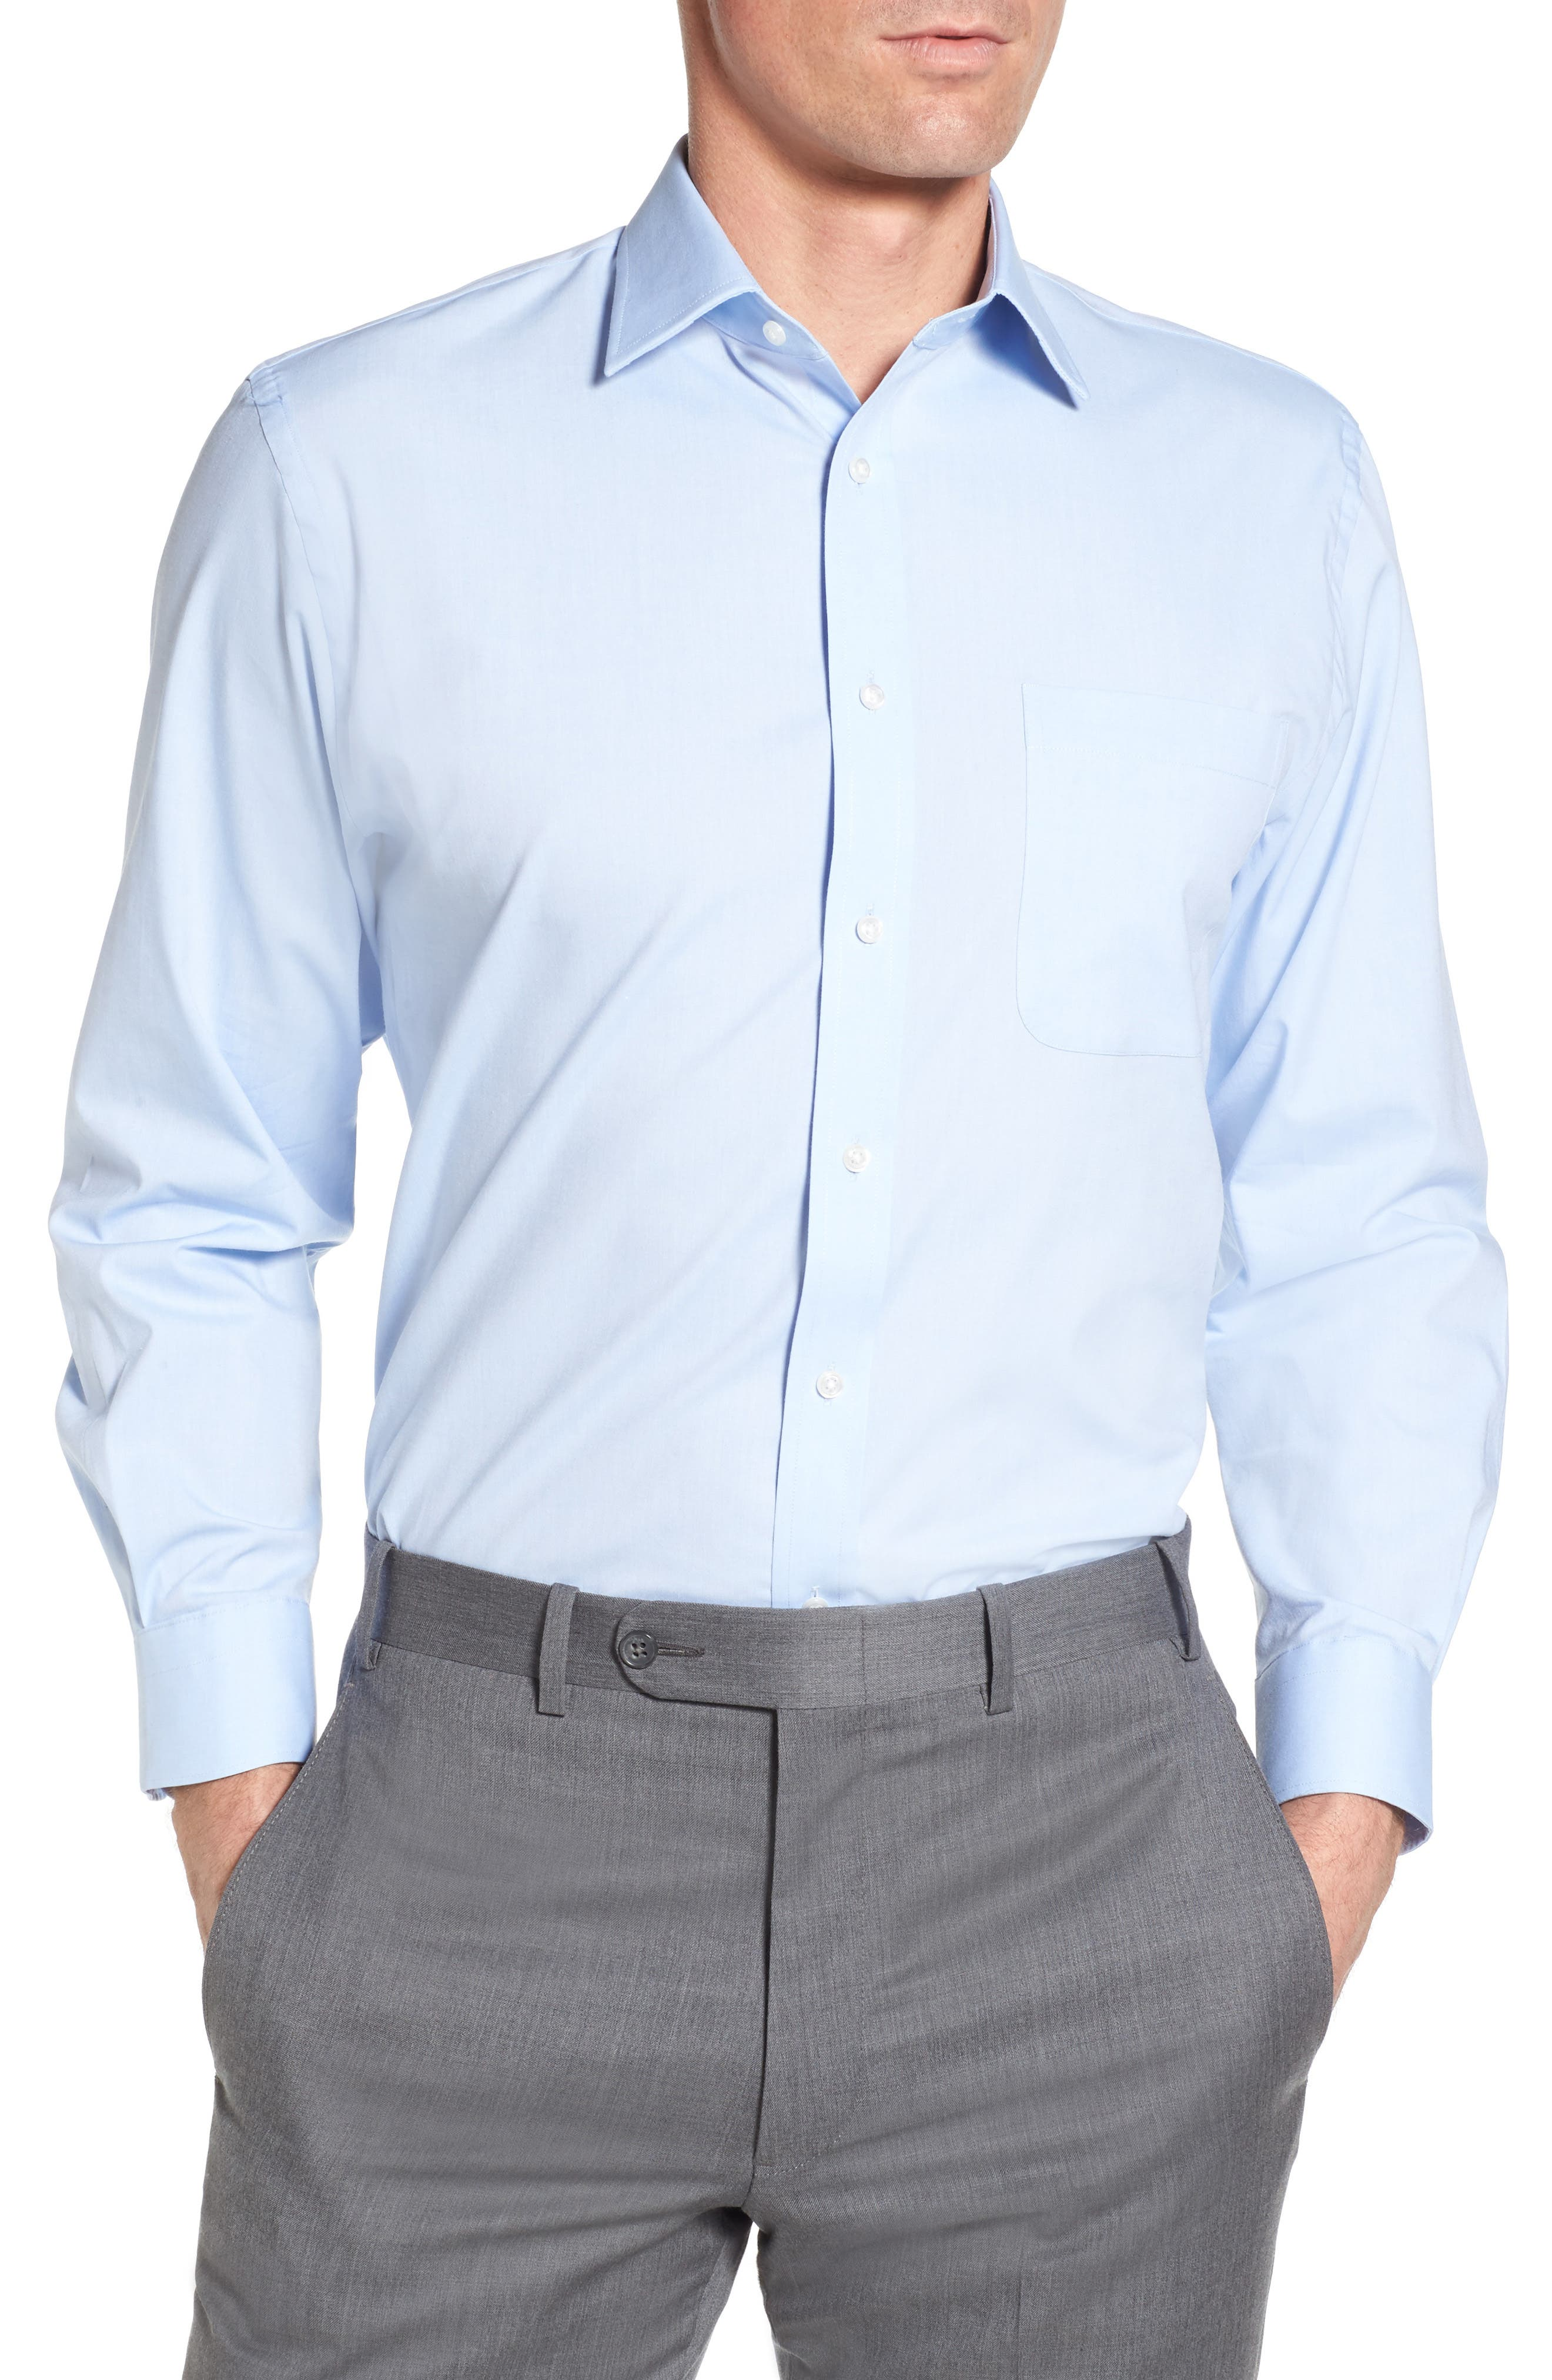 Nordstrom Menu0026#39;s Shop Tech-Smart Traditional Fit Stretch Solid Dress Shirt | Nordstrom